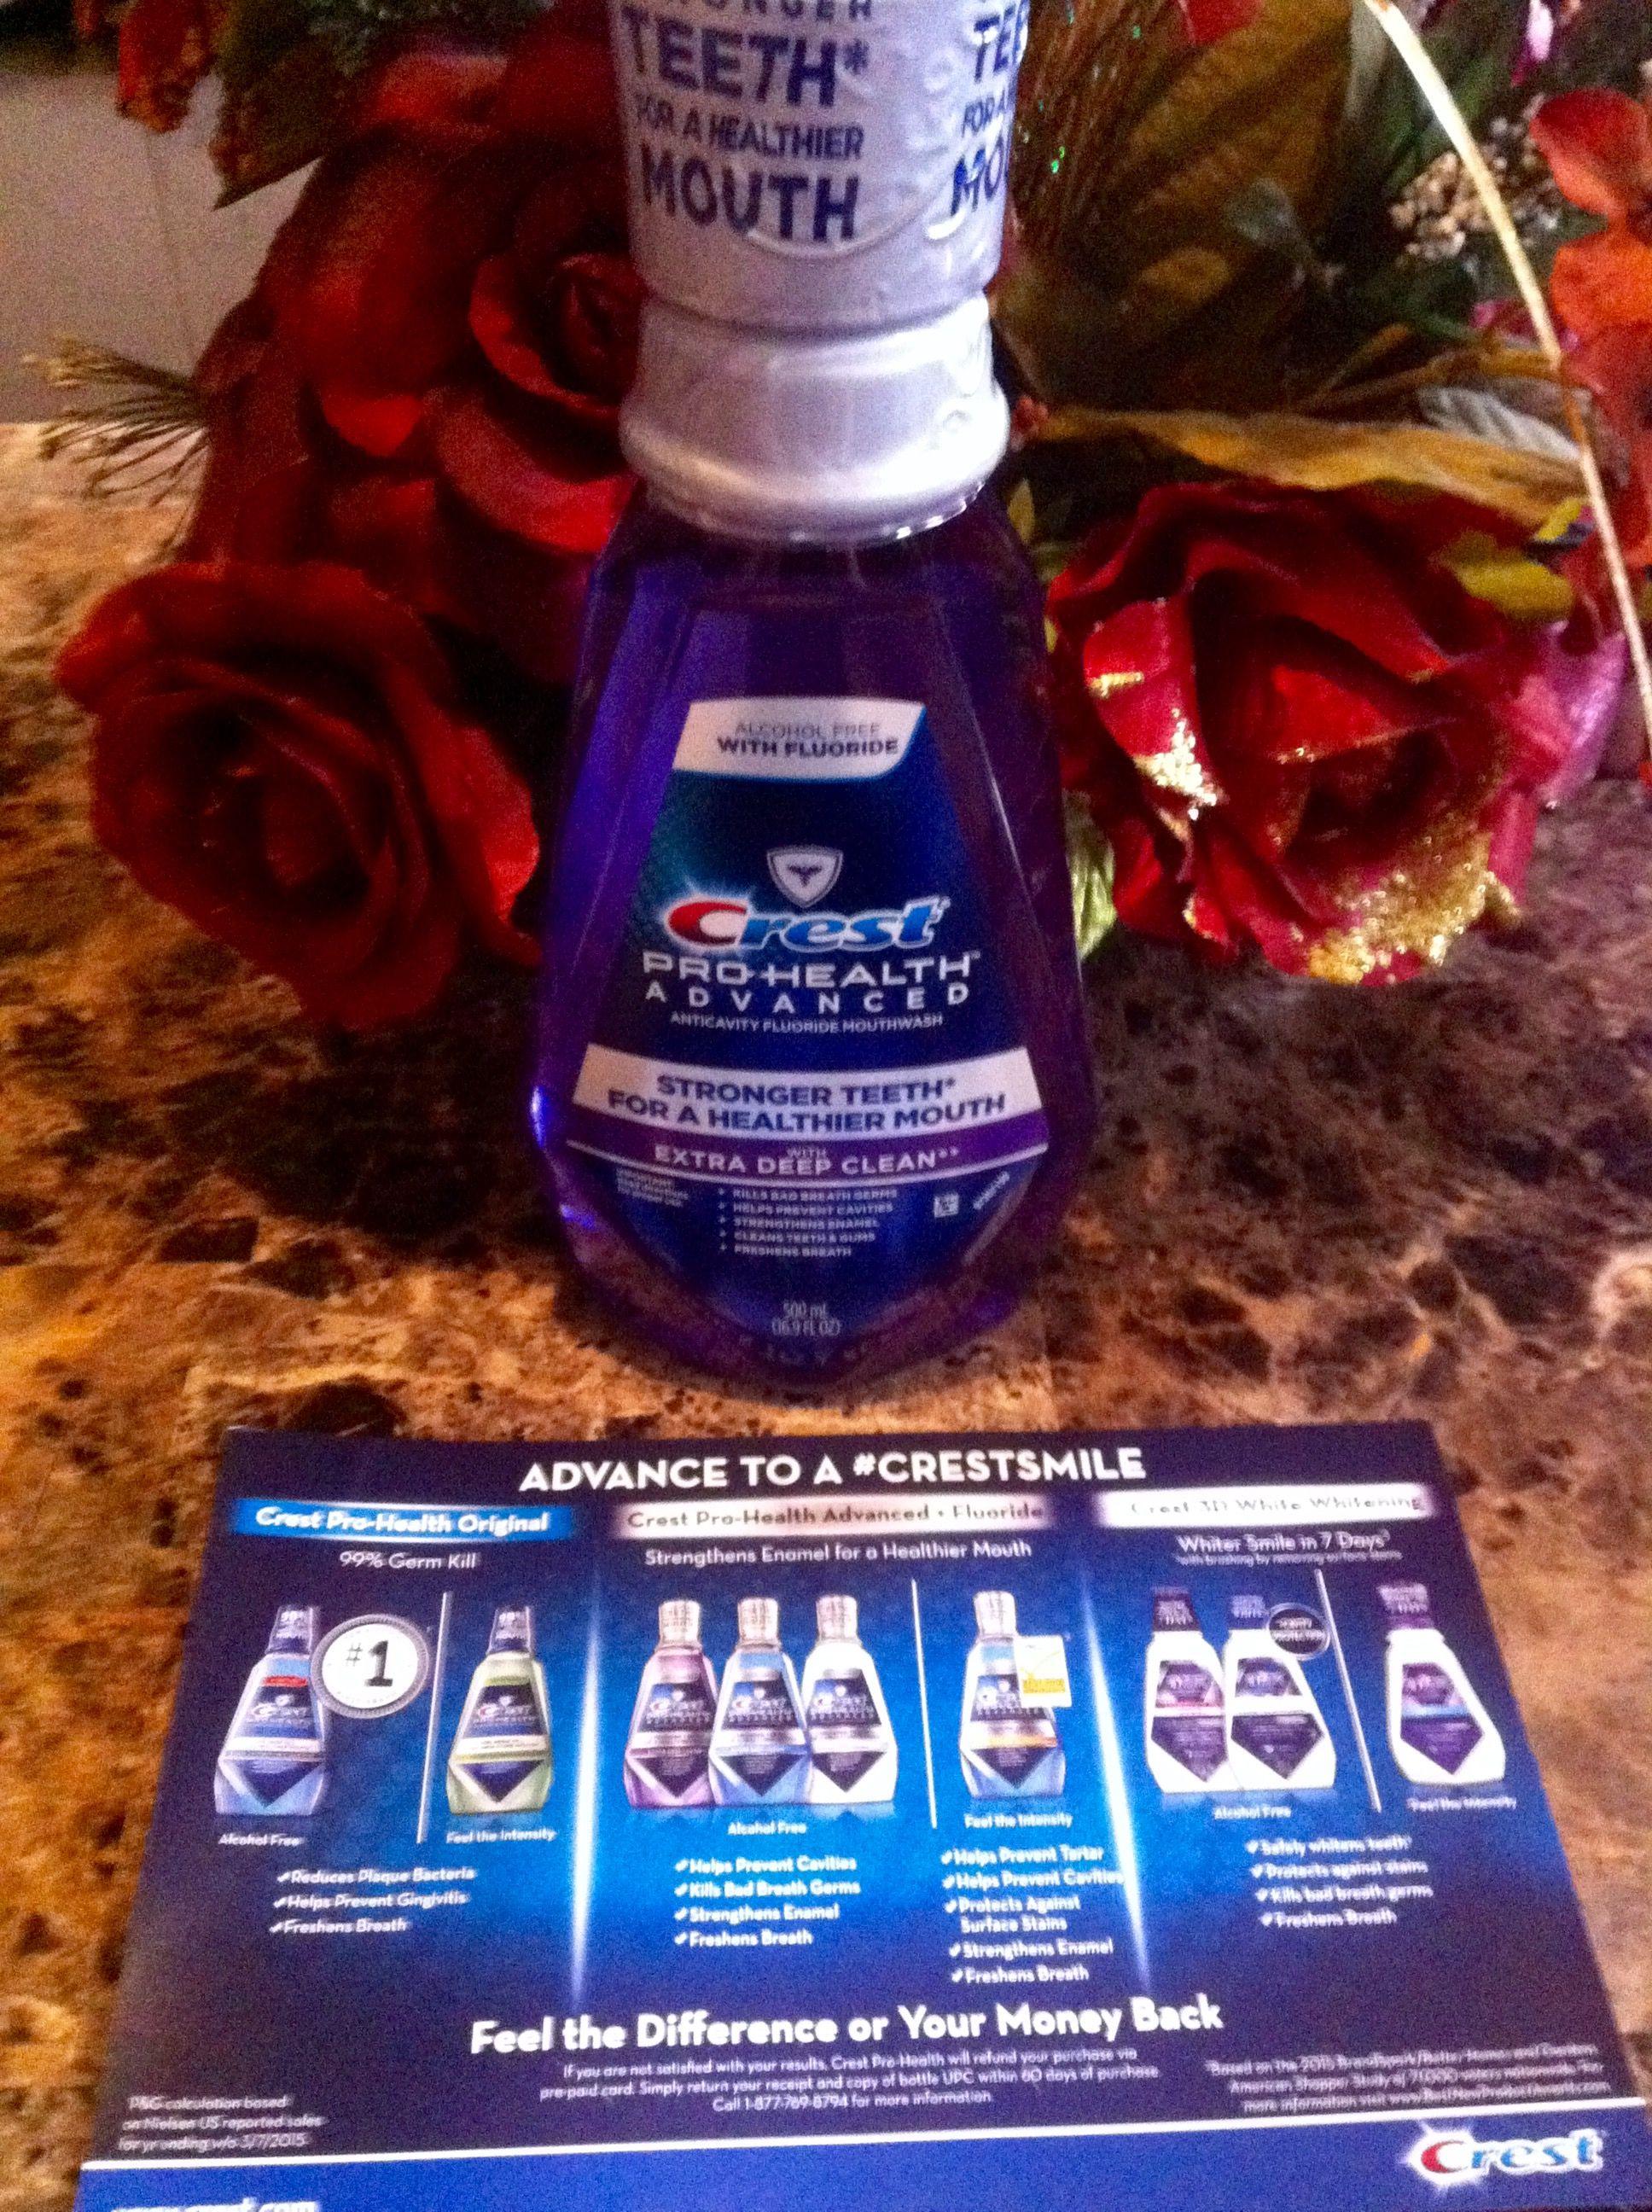 Crestprohealth mouthwash alcohol free bzzagent mission